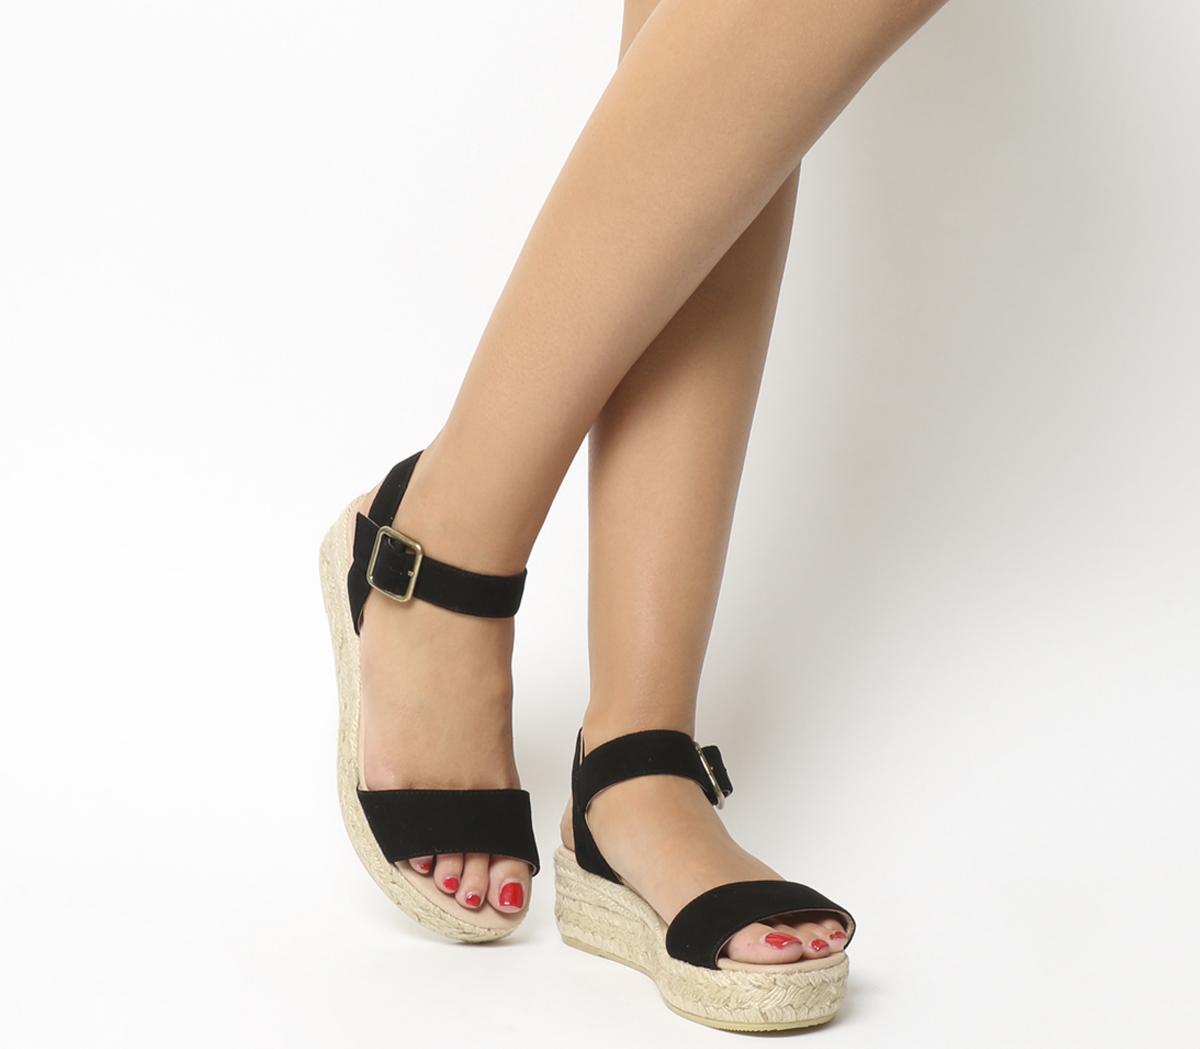 Jyle Flatform Sandals